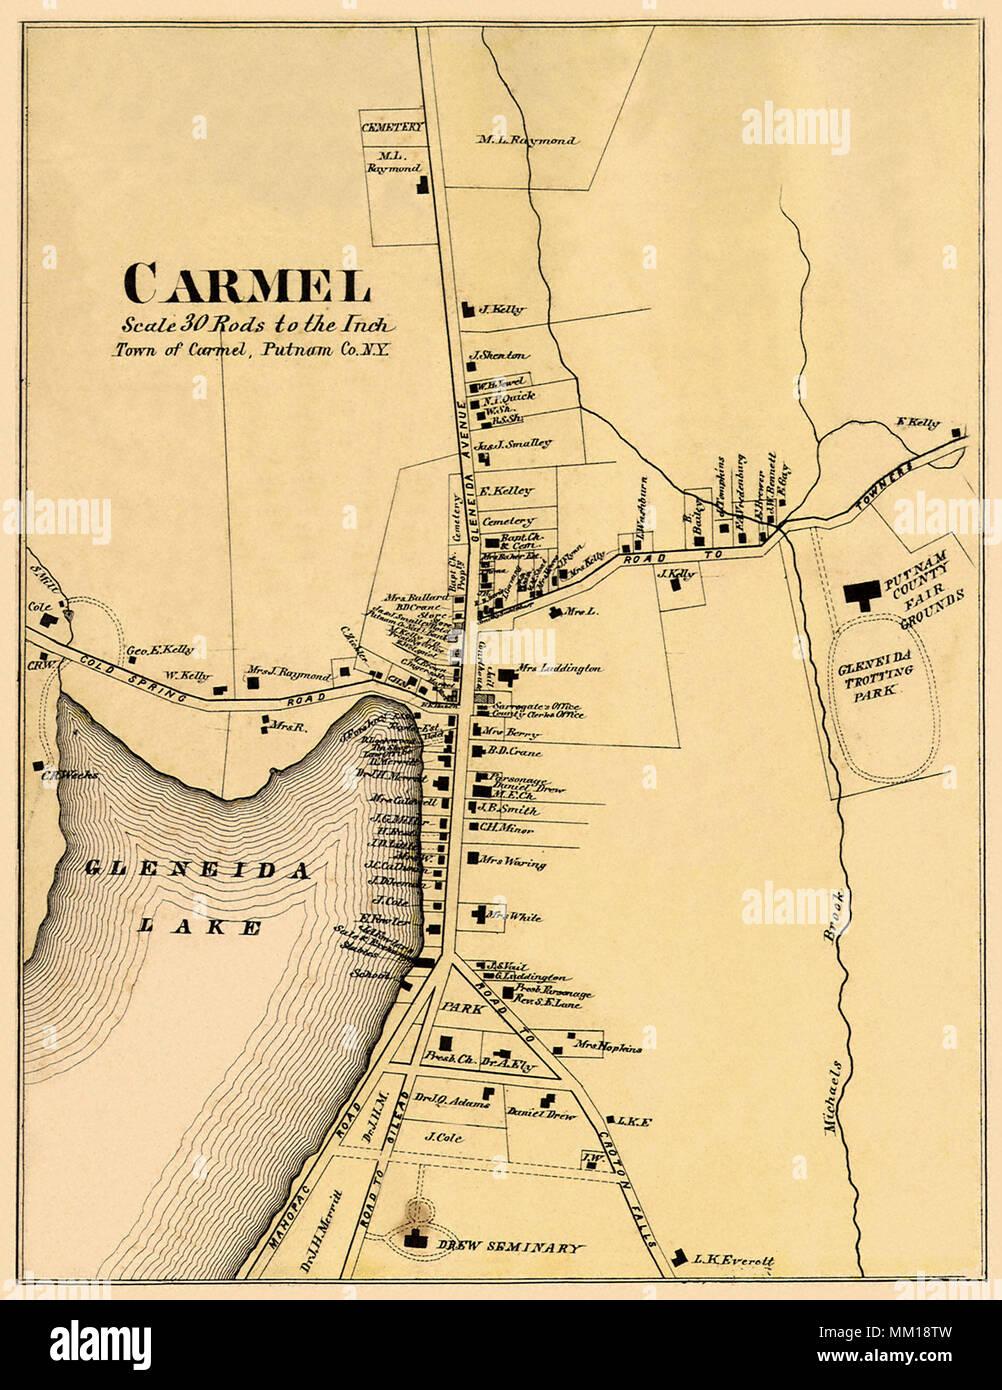 Map of Carmel. 1867 Stock Photo: 184425721 - Alamy Carmel Map on